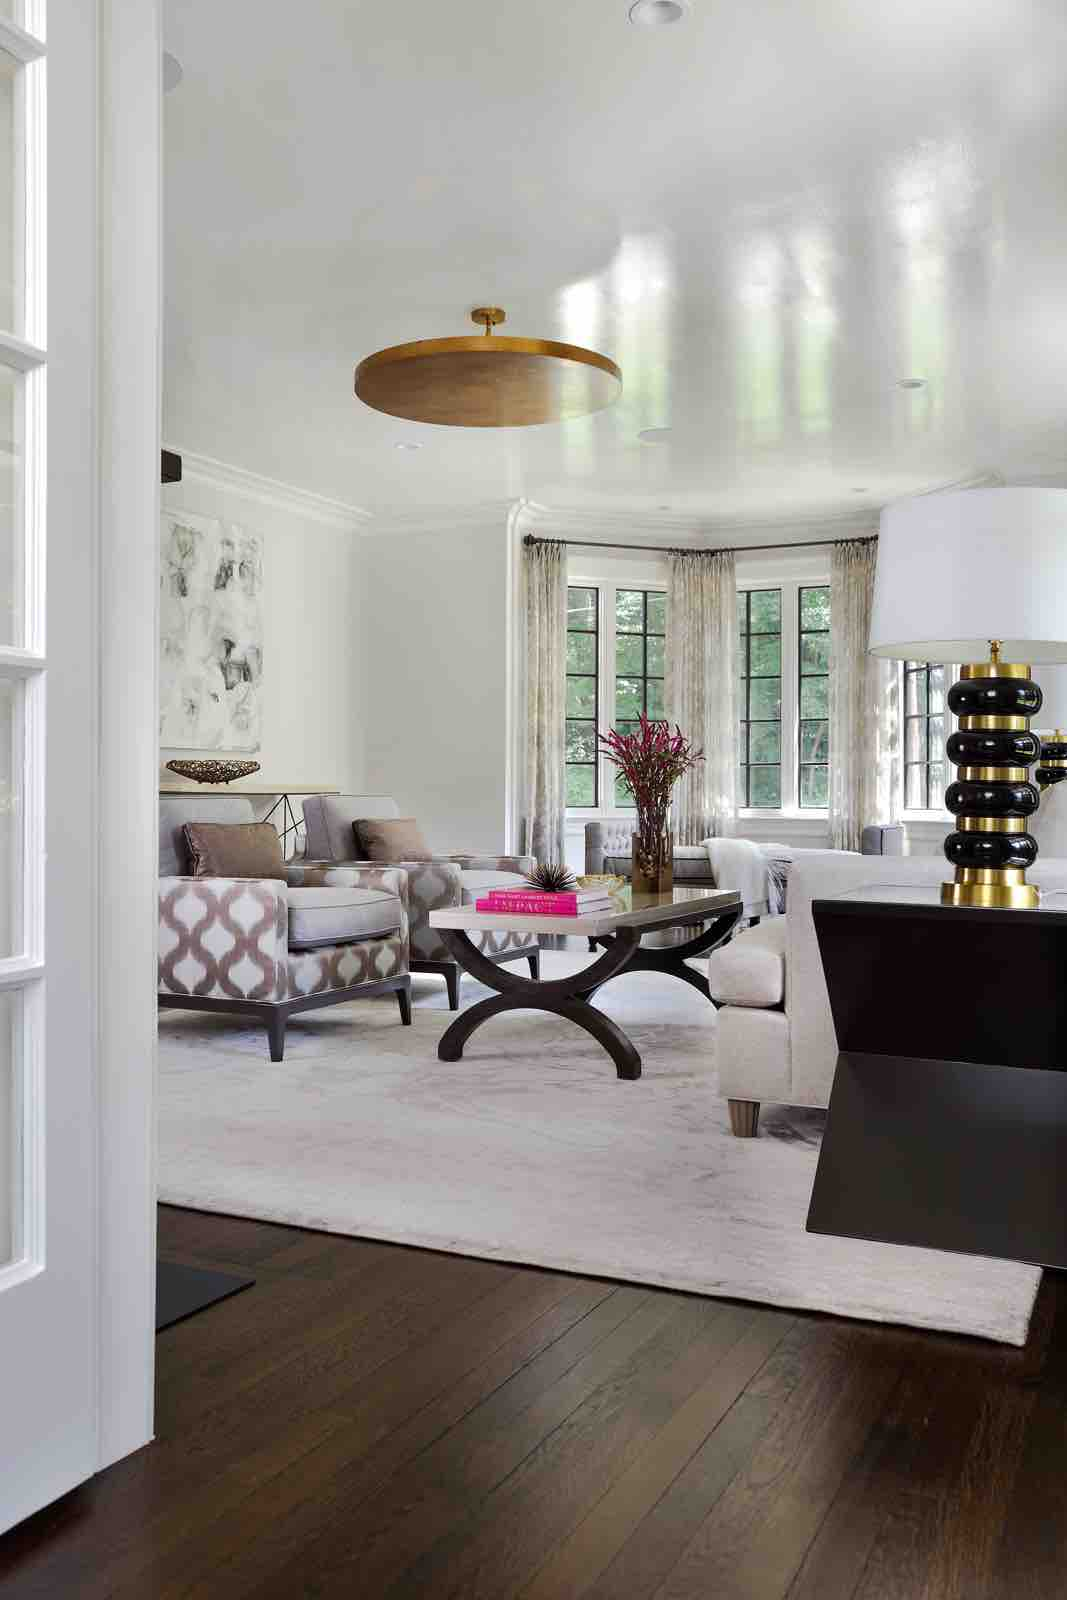 Living Room – Summit, NJ Home Renovation